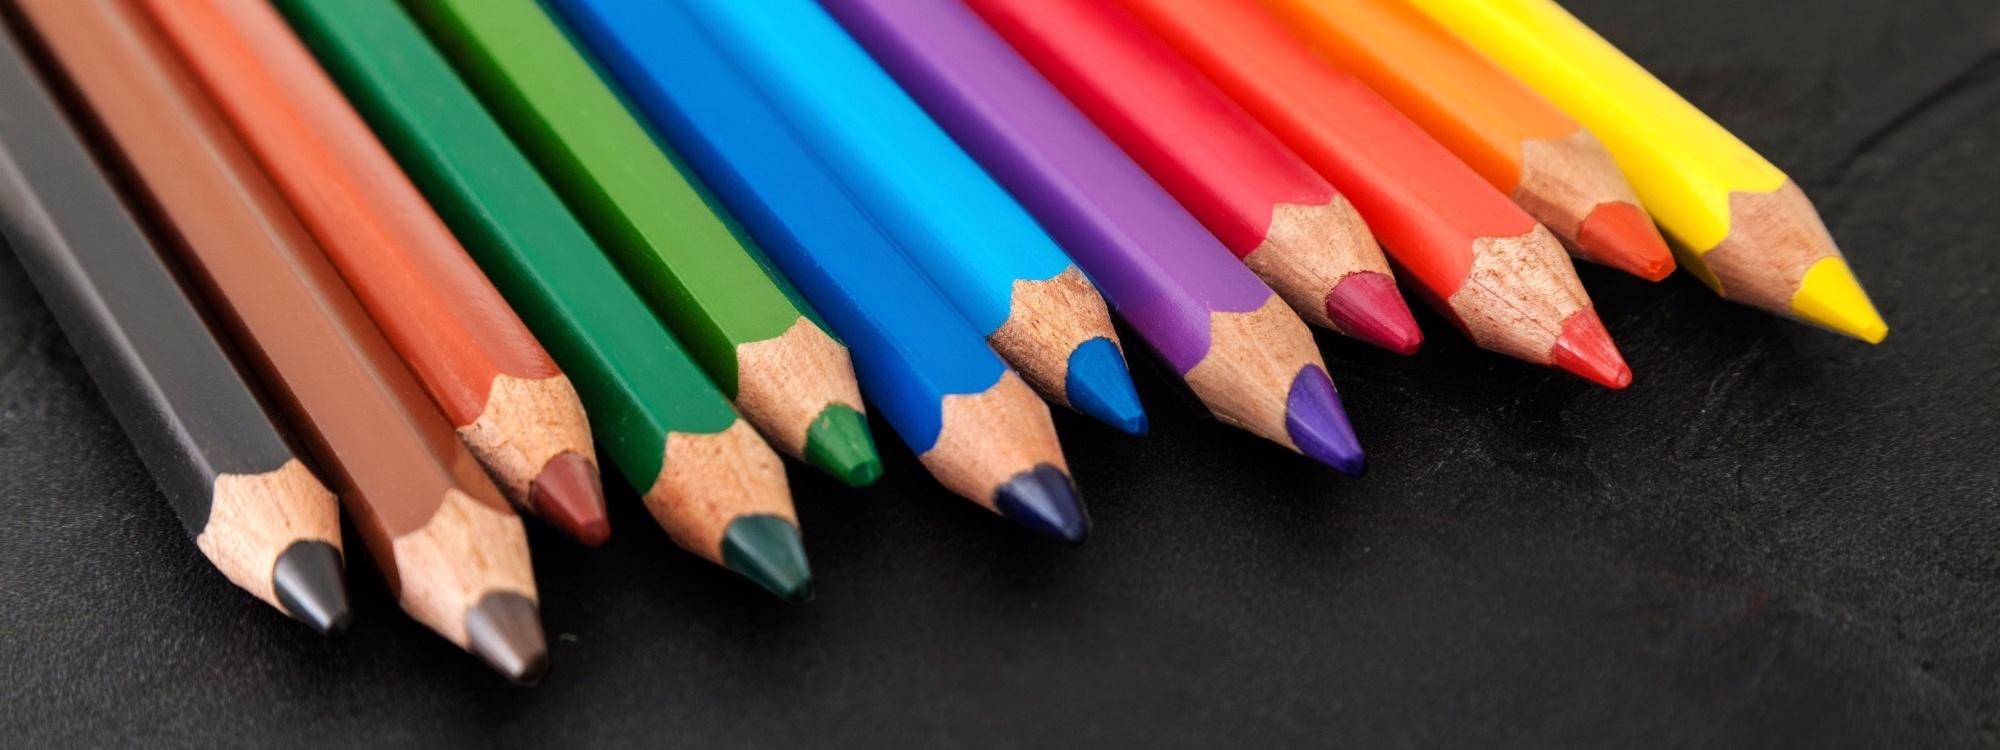 coloured-pencils-1.jpg